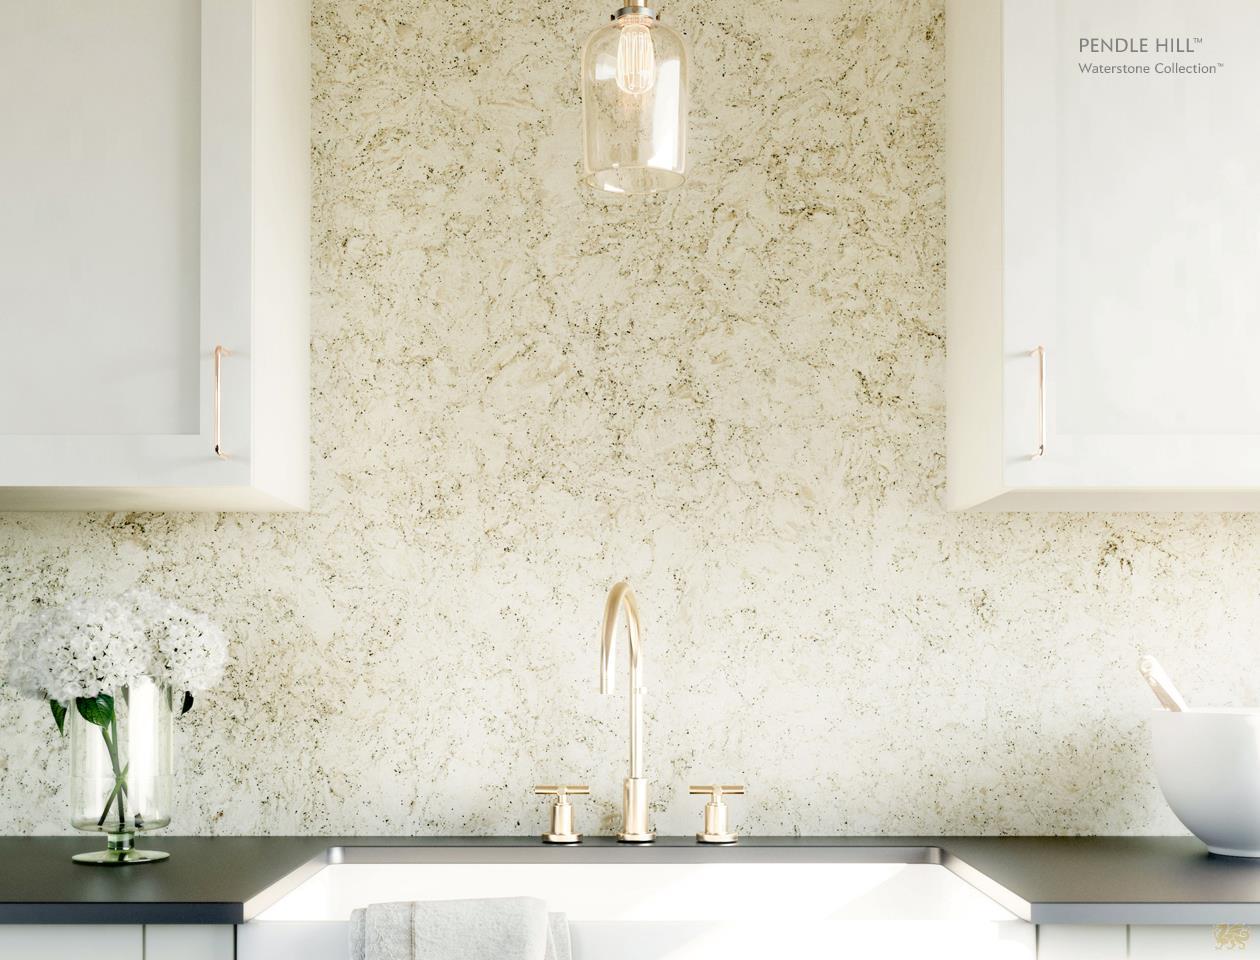 Five New Cambria Designs Floform Countertops